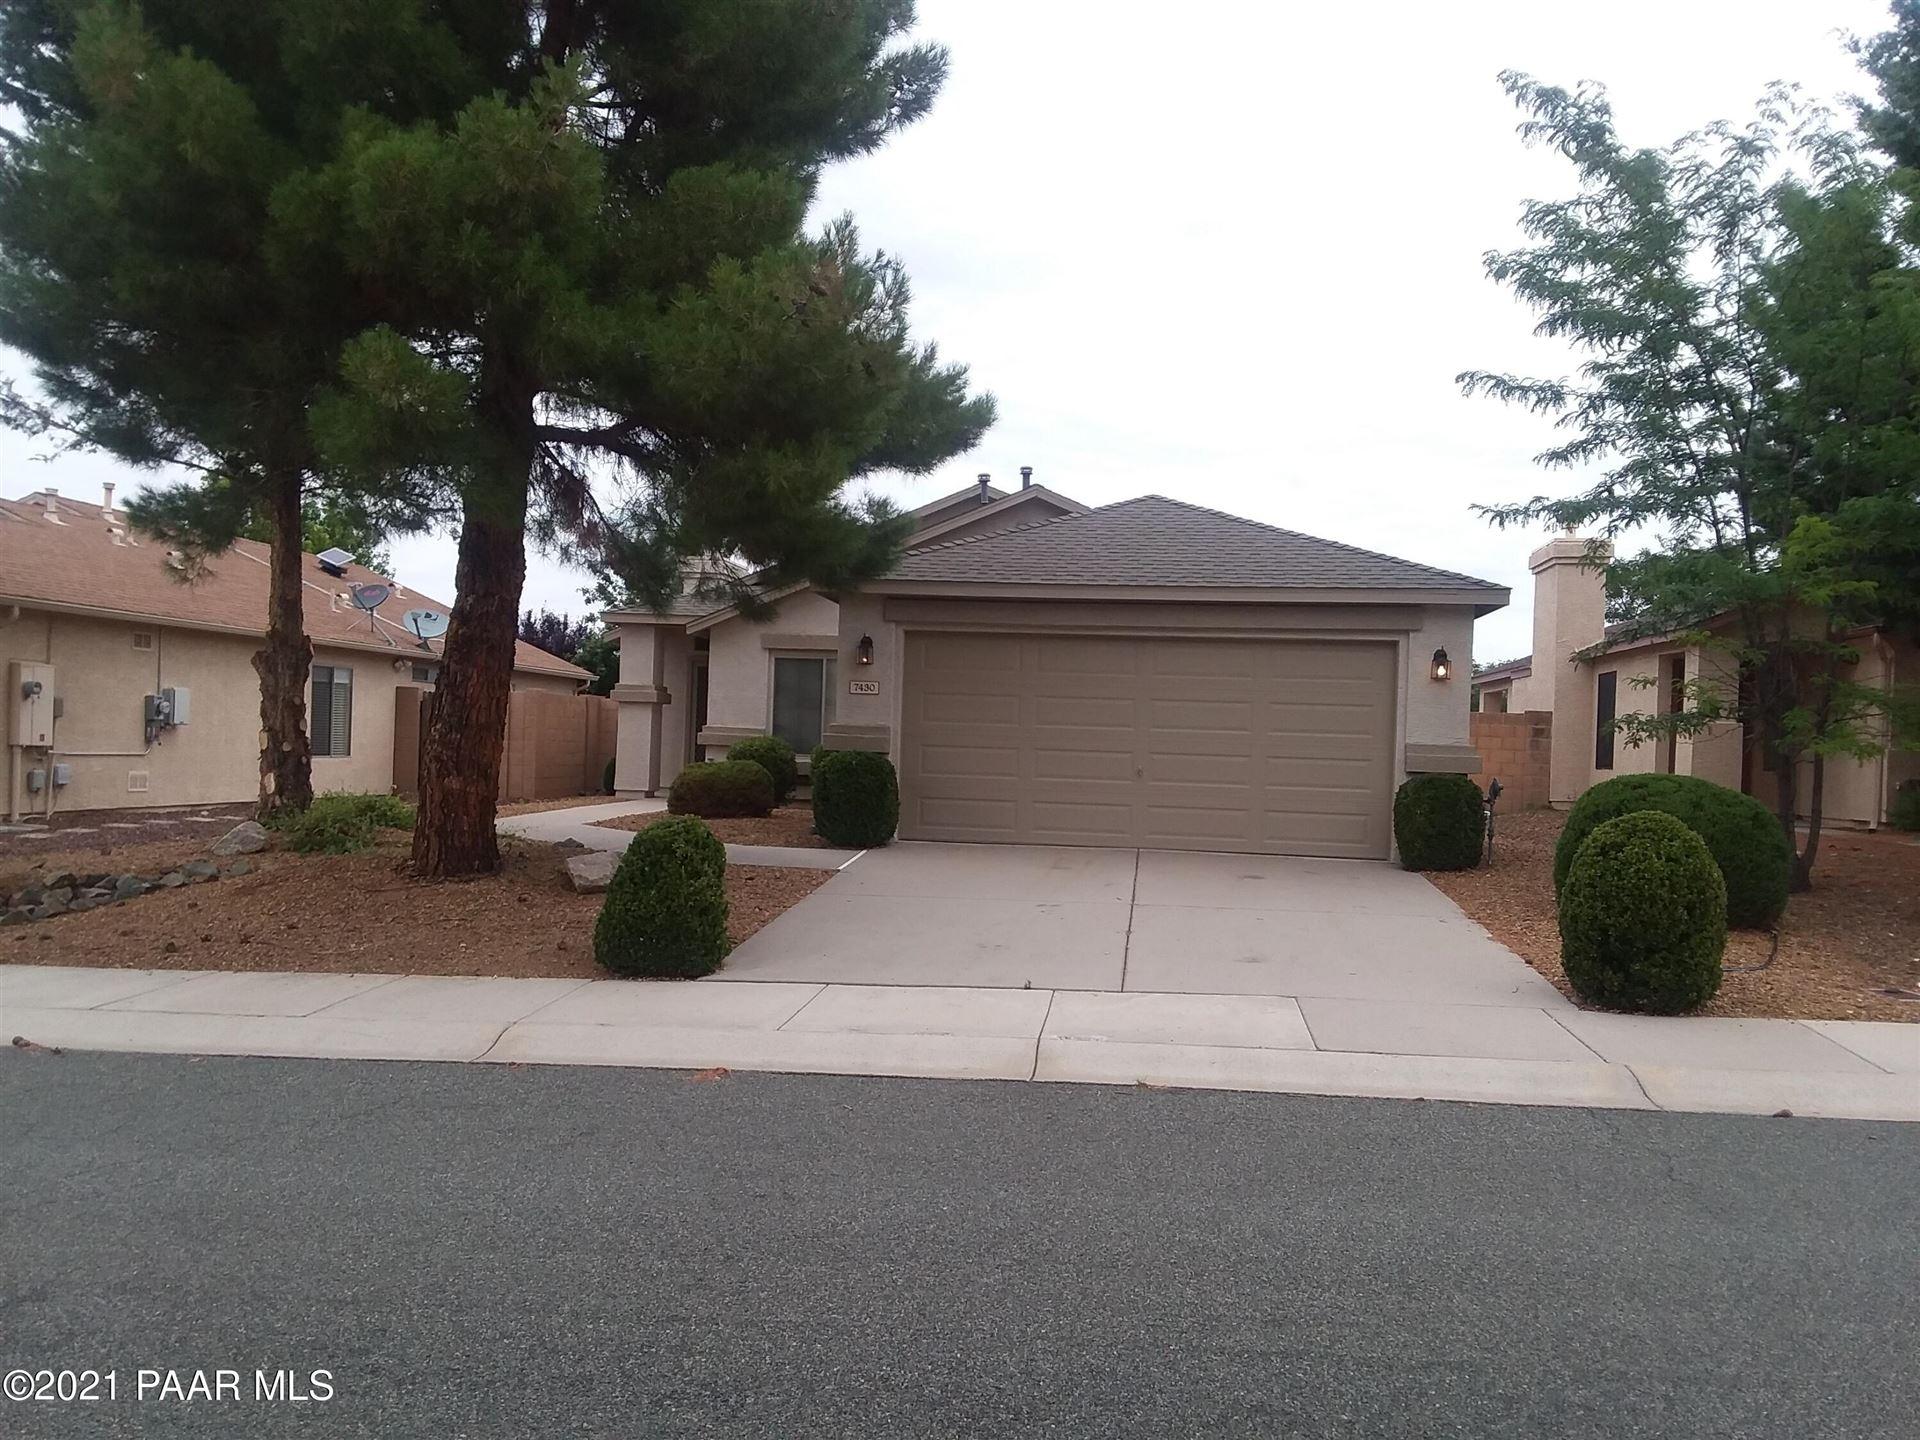 Photo of 7430 E Plateau Ridge Road #Lot: 903, Prescott Valley, AZ 86315 (MLS # 1040487)